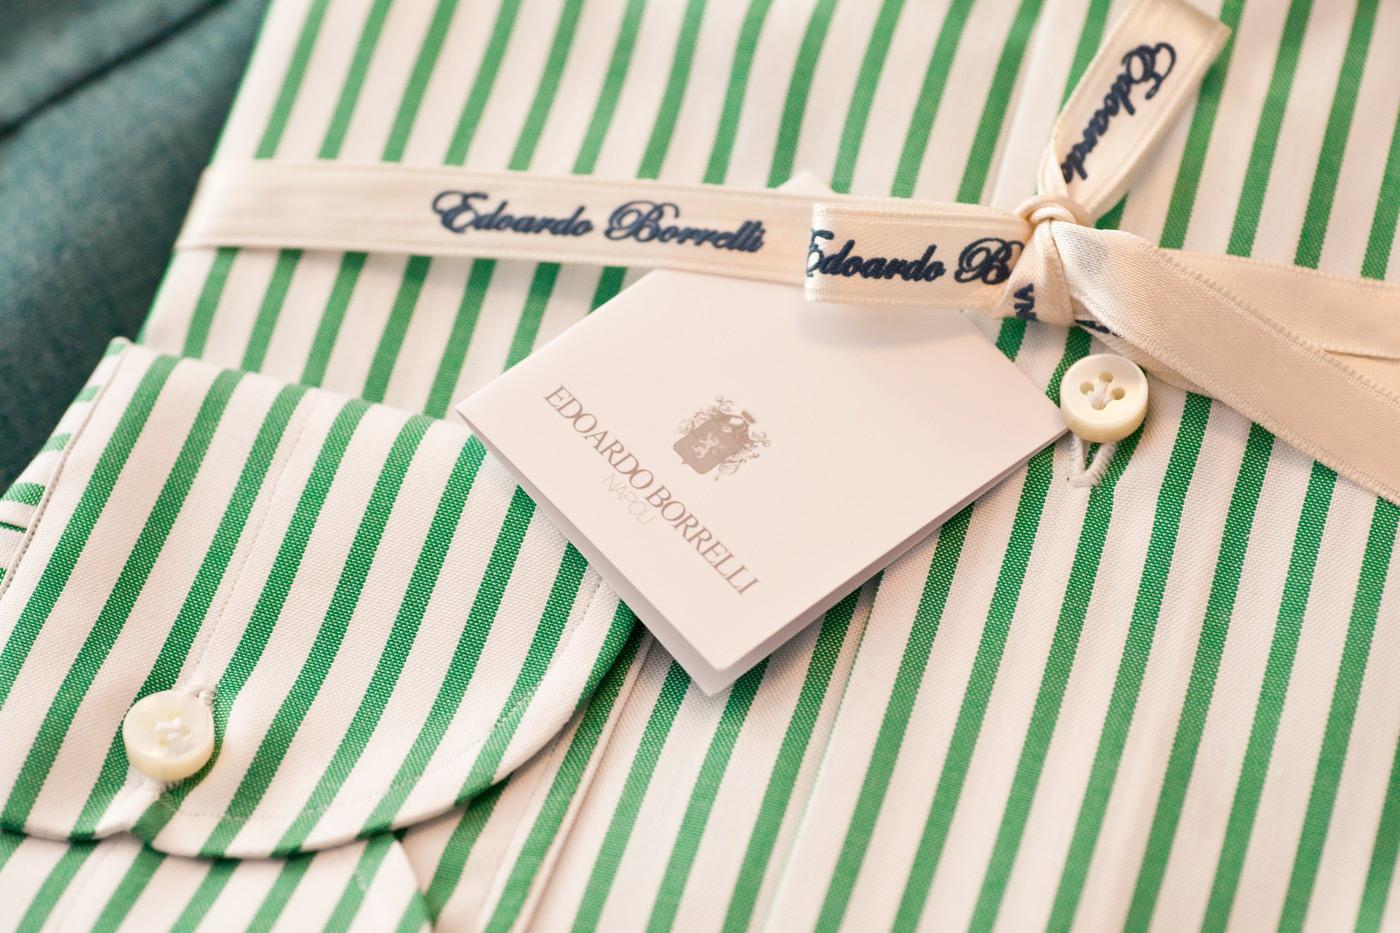 Why Edoardo Borrelli Is Synonymous With Flawless Menswear